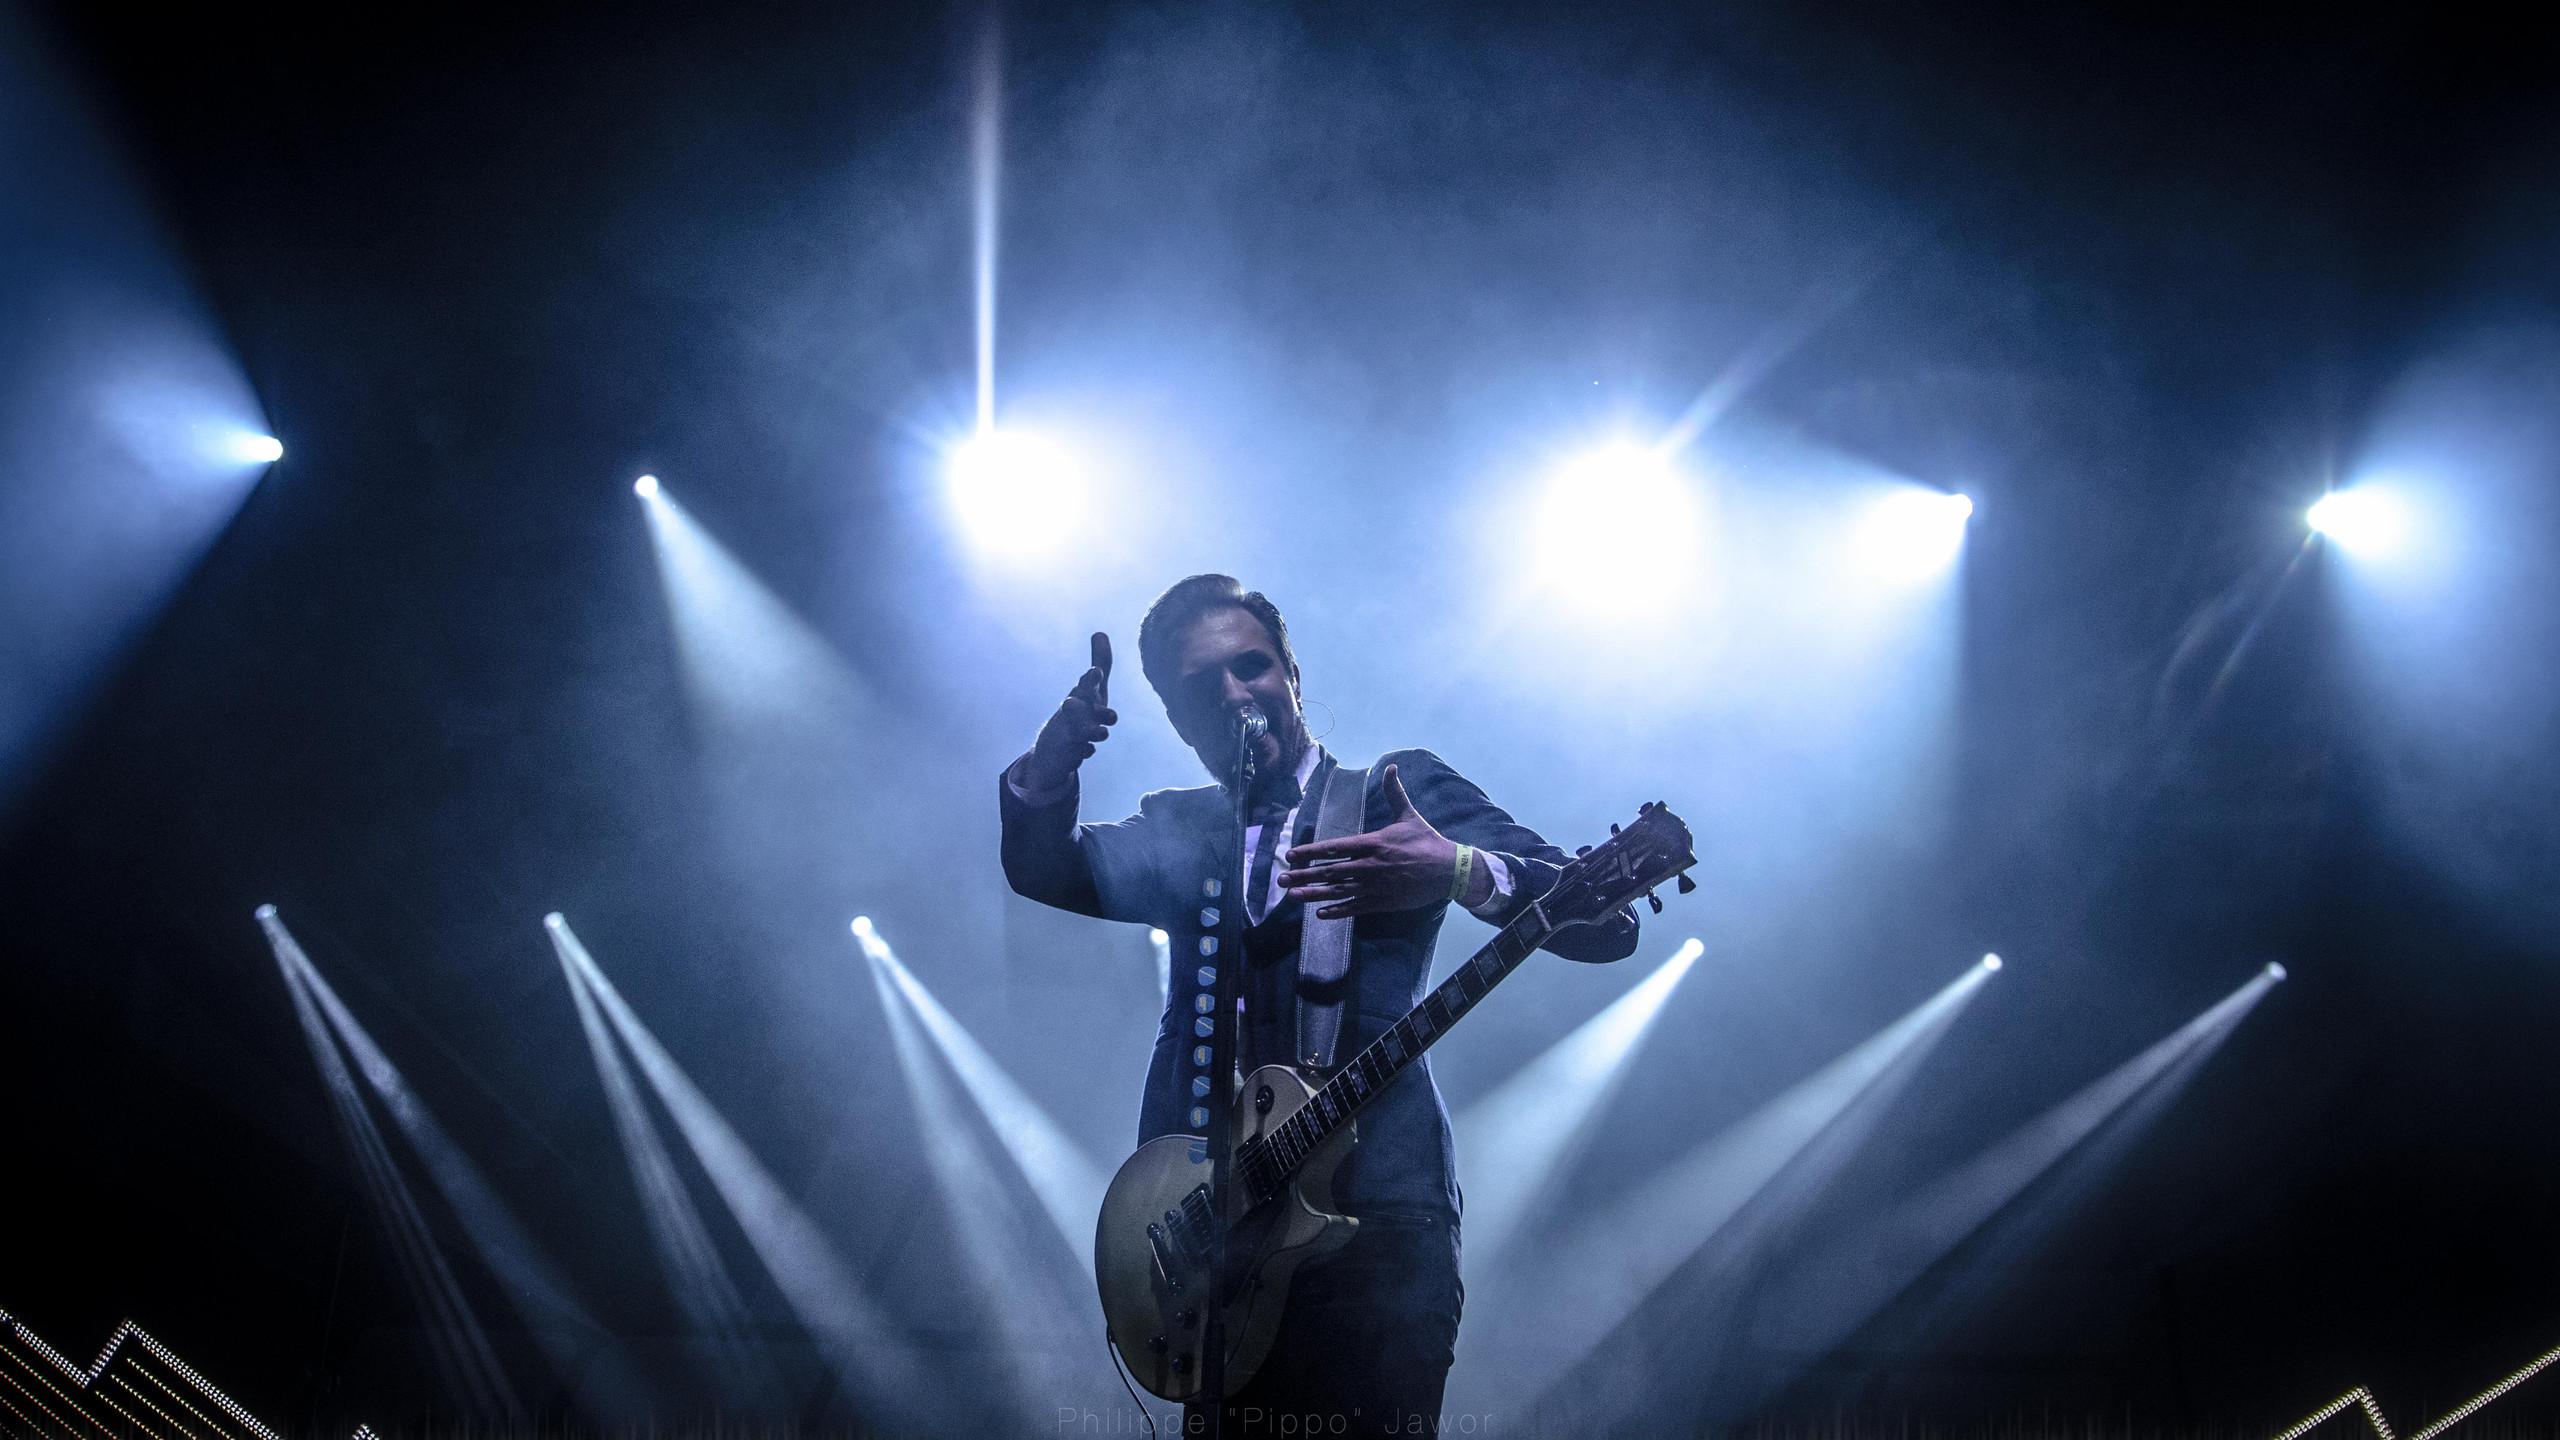 Adam Grahn, lead singer of the Swedish rock band Royal Republic, at Rock en Seine festival, August 2016.